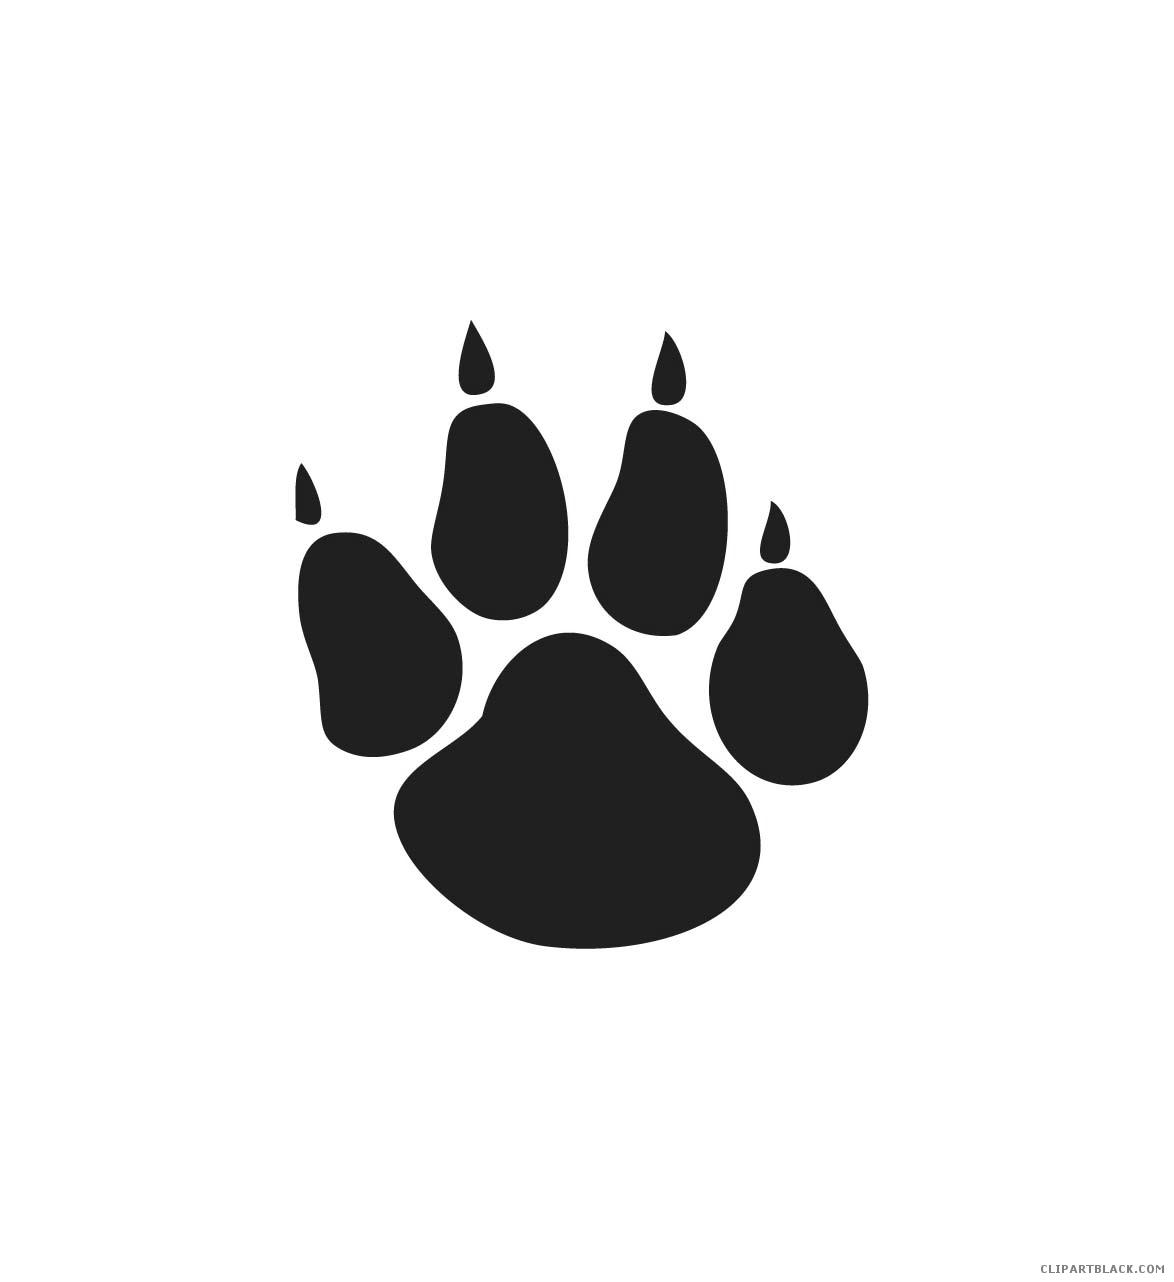 Bobcat clipart paw print. Animal free black white